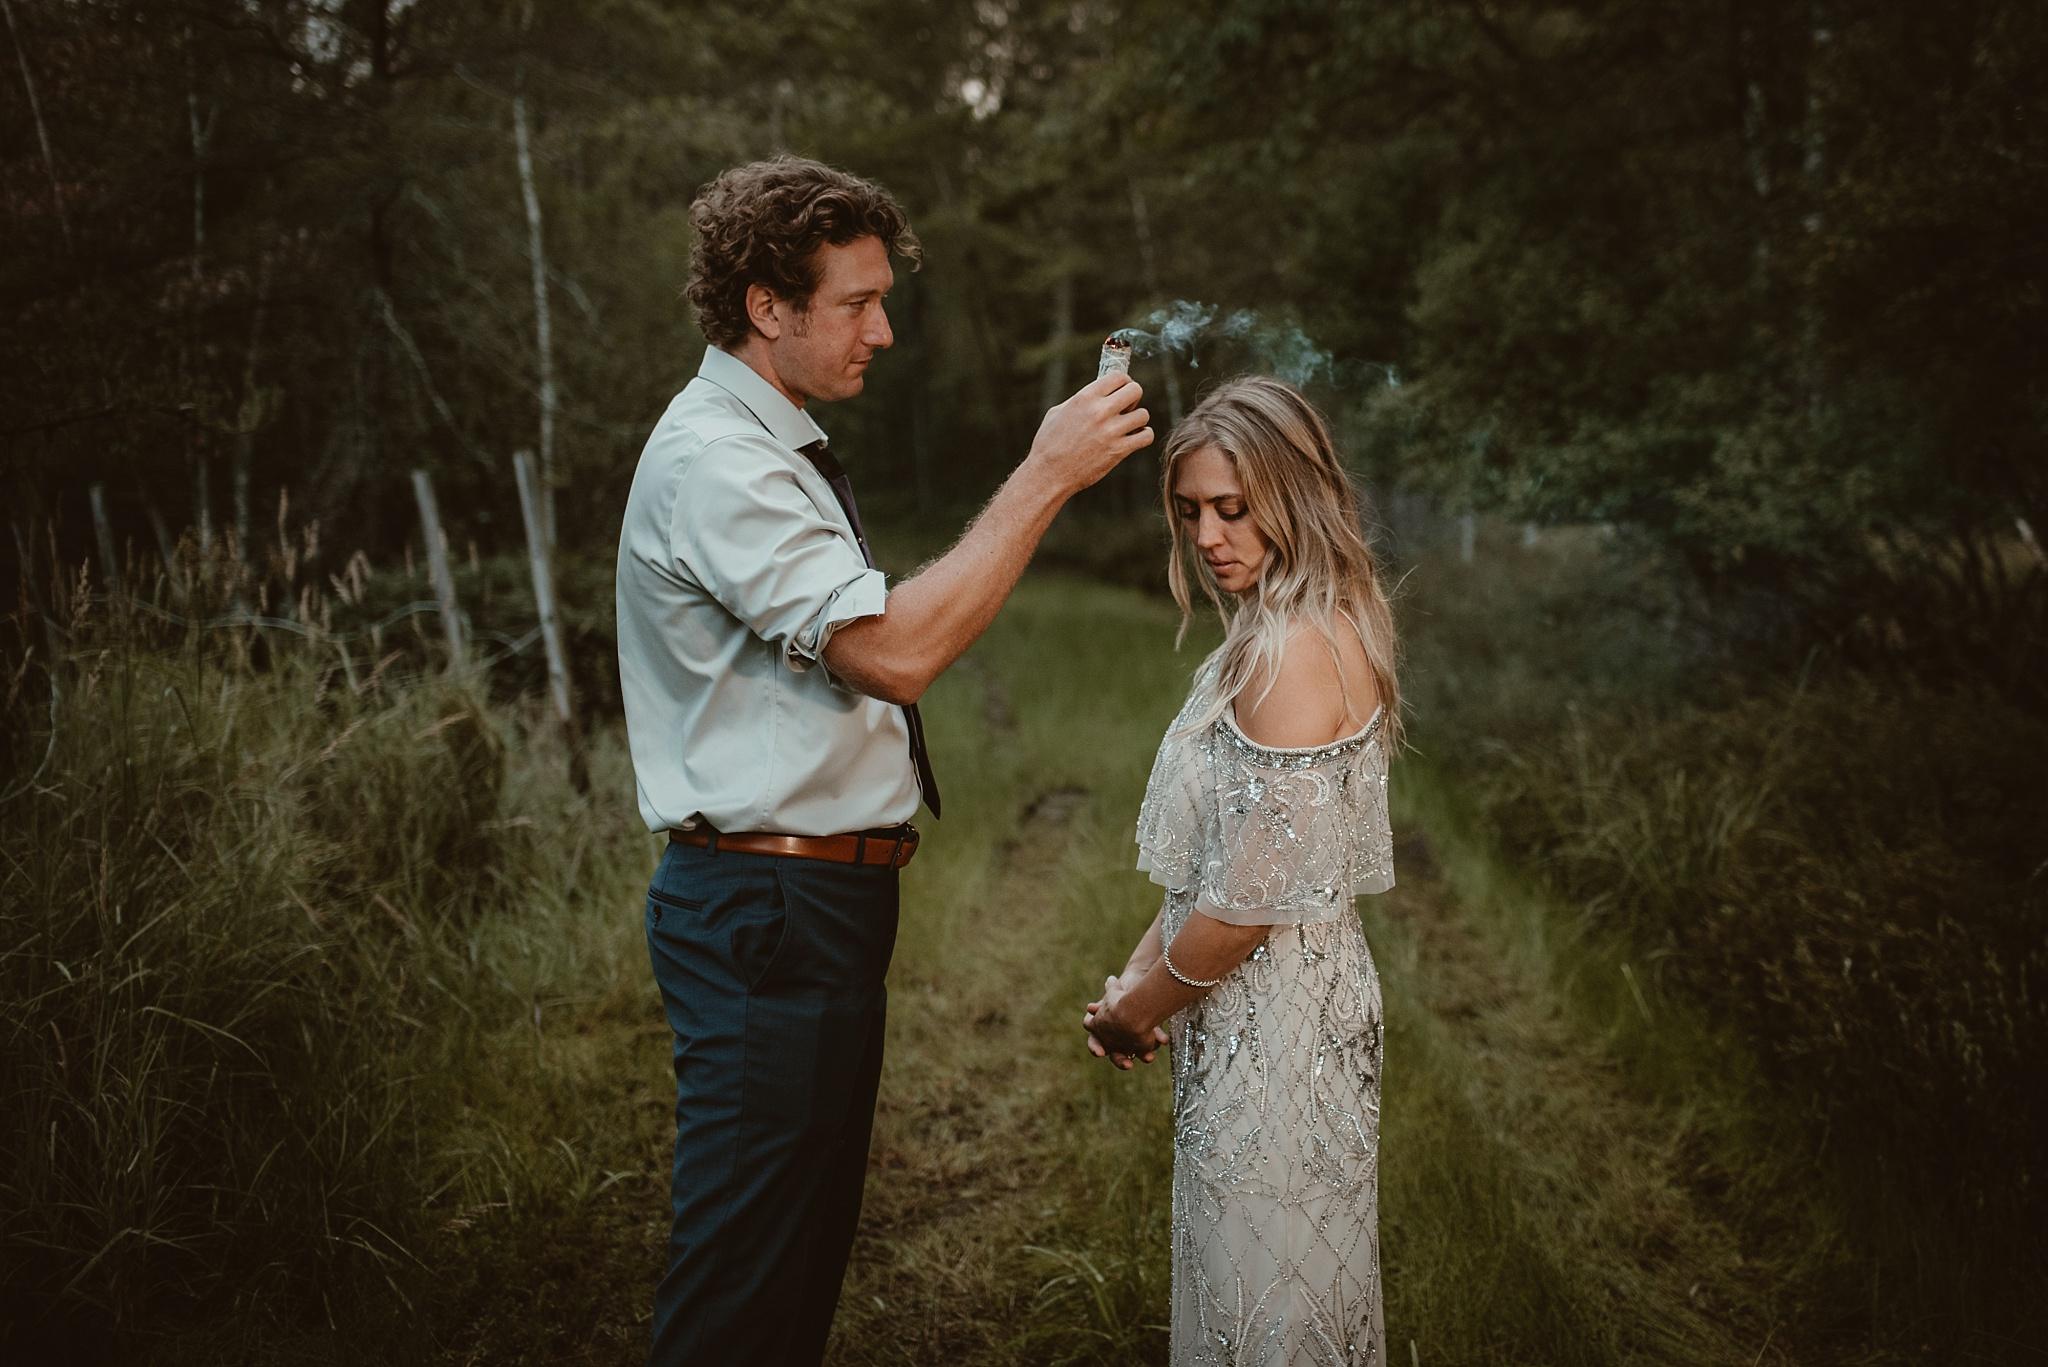 Intimate-Wedding-Higgins-Lake-Michigan-Photography-Northern-Mi-Non-Traditional-Spiritual-Organic-Wedding-Story-Shonda-Michelson-Photography,Northern-Michigan-Photographer,